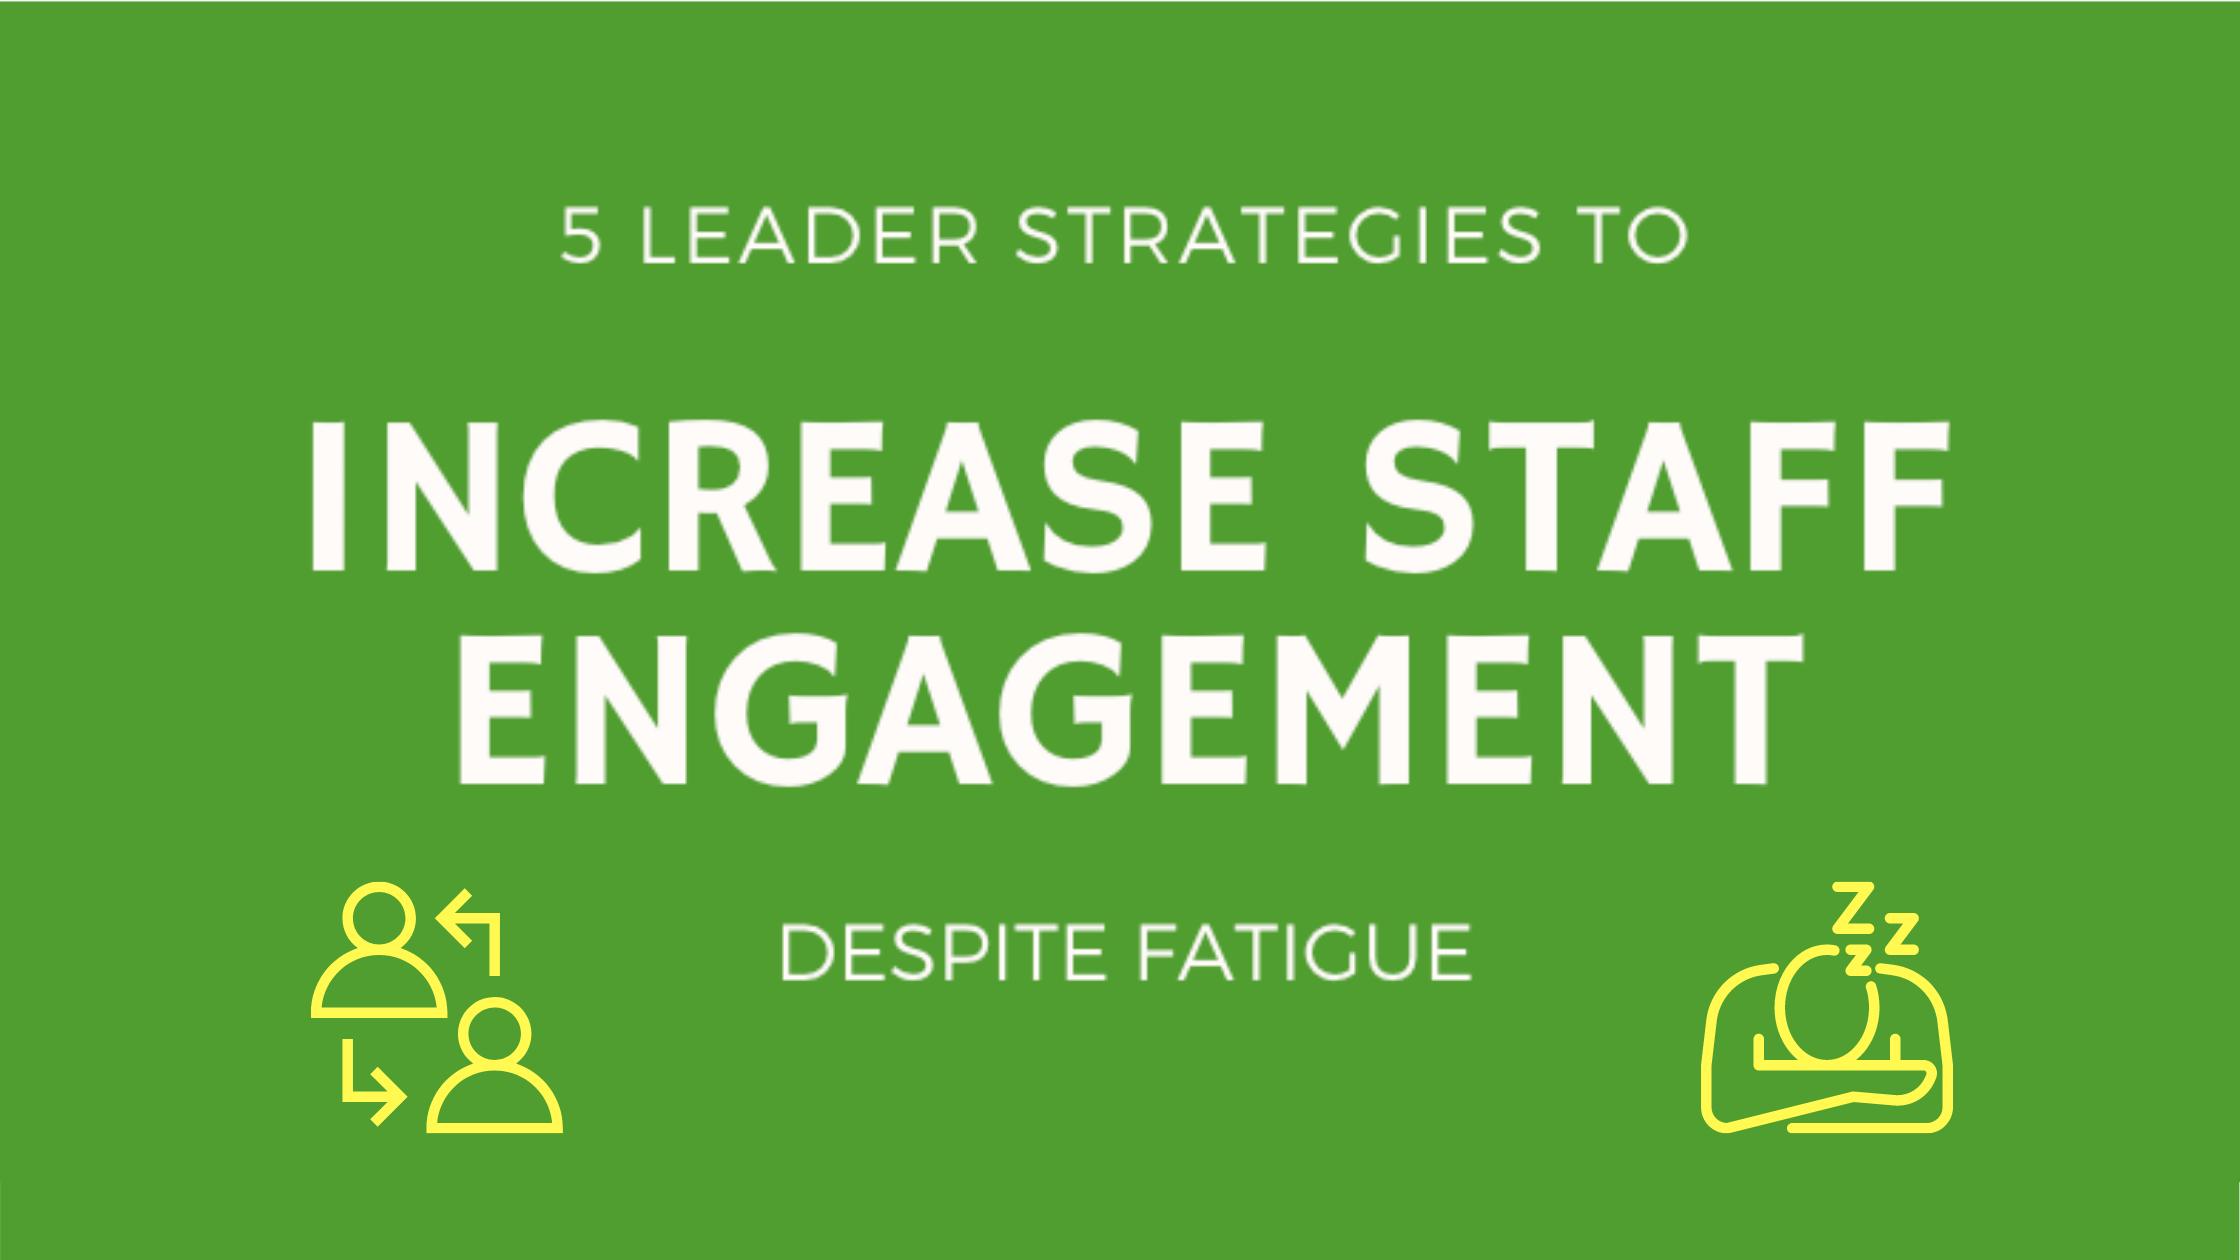 5-Leader-Strategies-to-Increase-Engagement-Despite-Fatigue